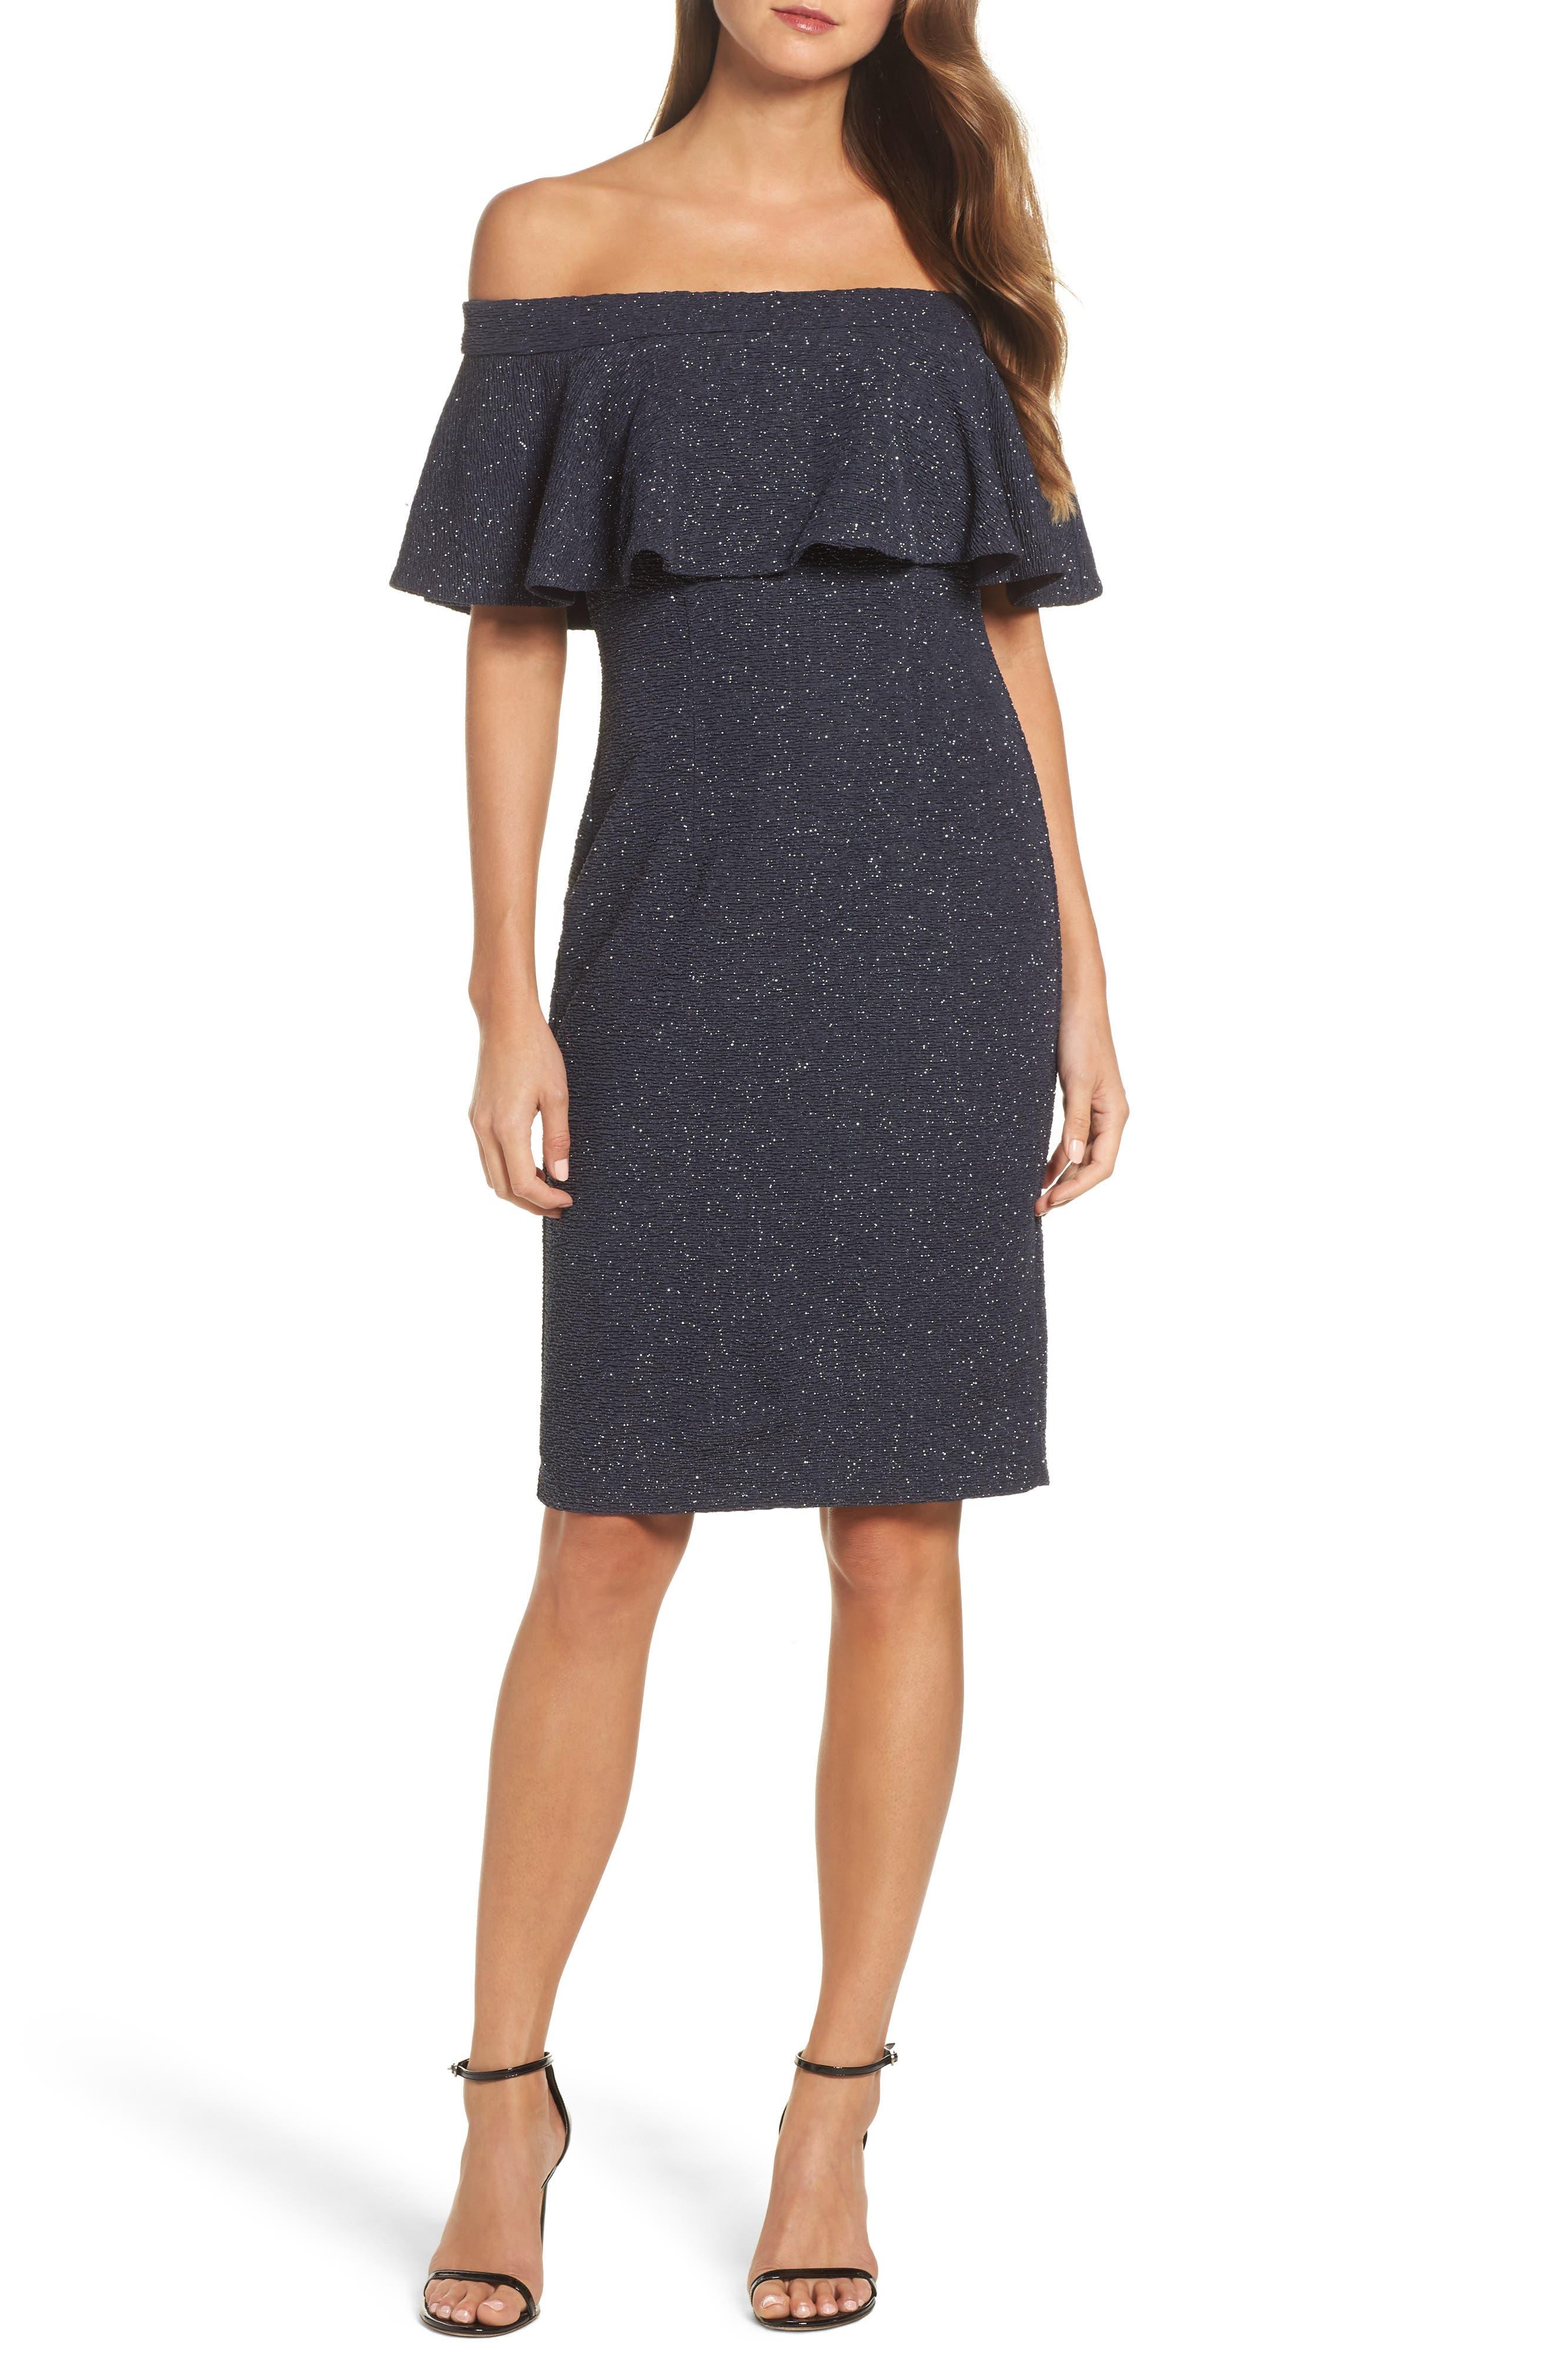 Main Image - Eliza J Glitter Knit Ruffle Off the Shoulder Dress